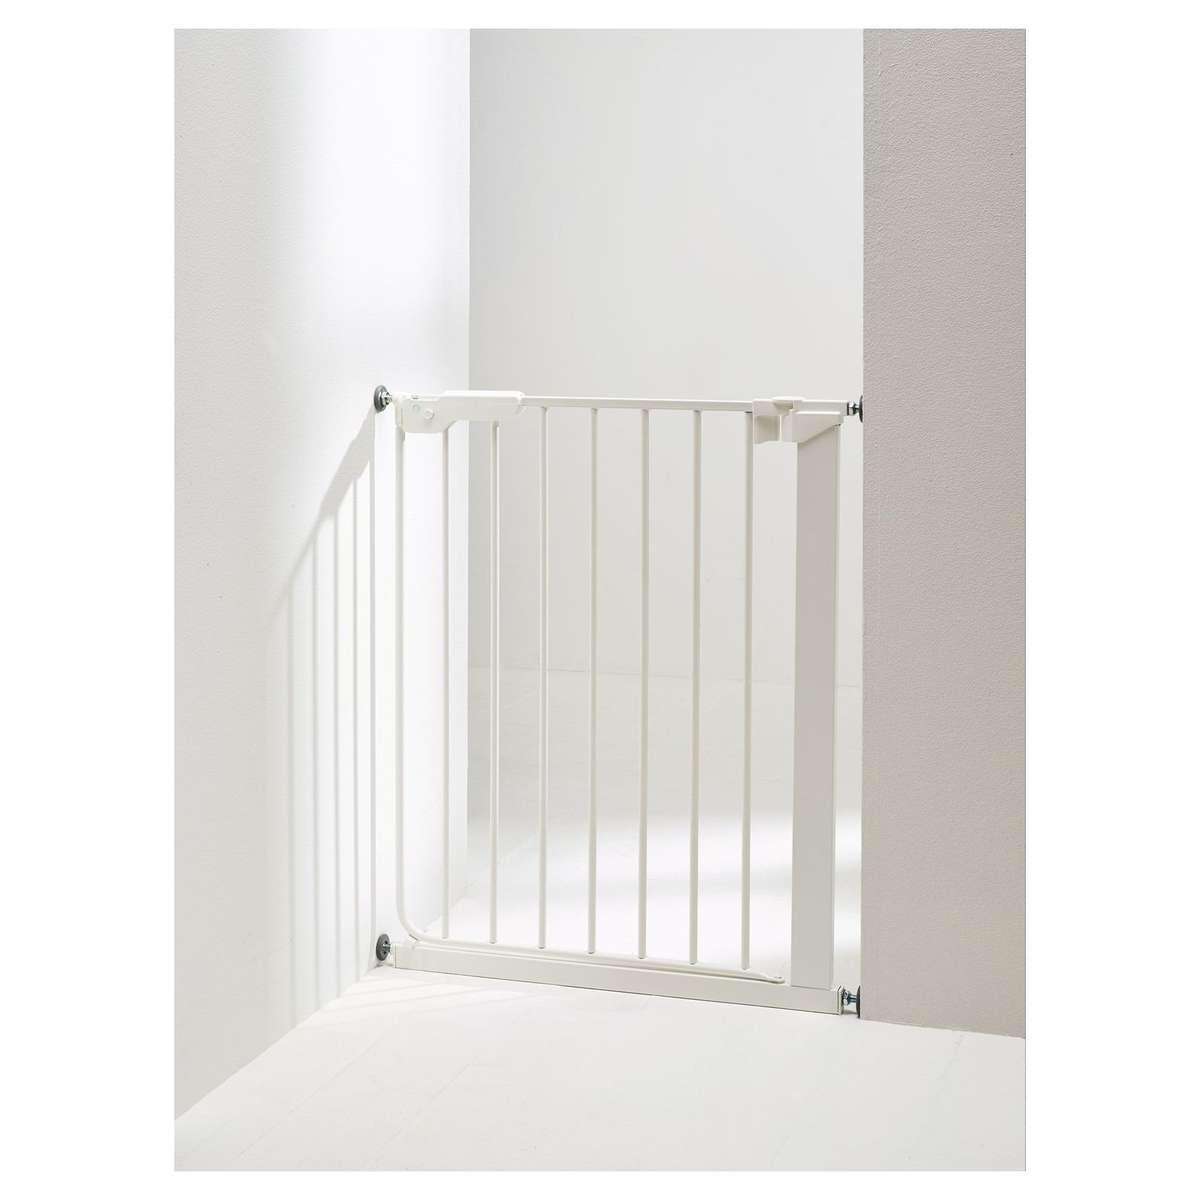 babydan barri re de s curit troite en m tal slimfit blanc barri re de s curit babydan sur. Black Bedroom Furniture Sets. Home Design Ideas